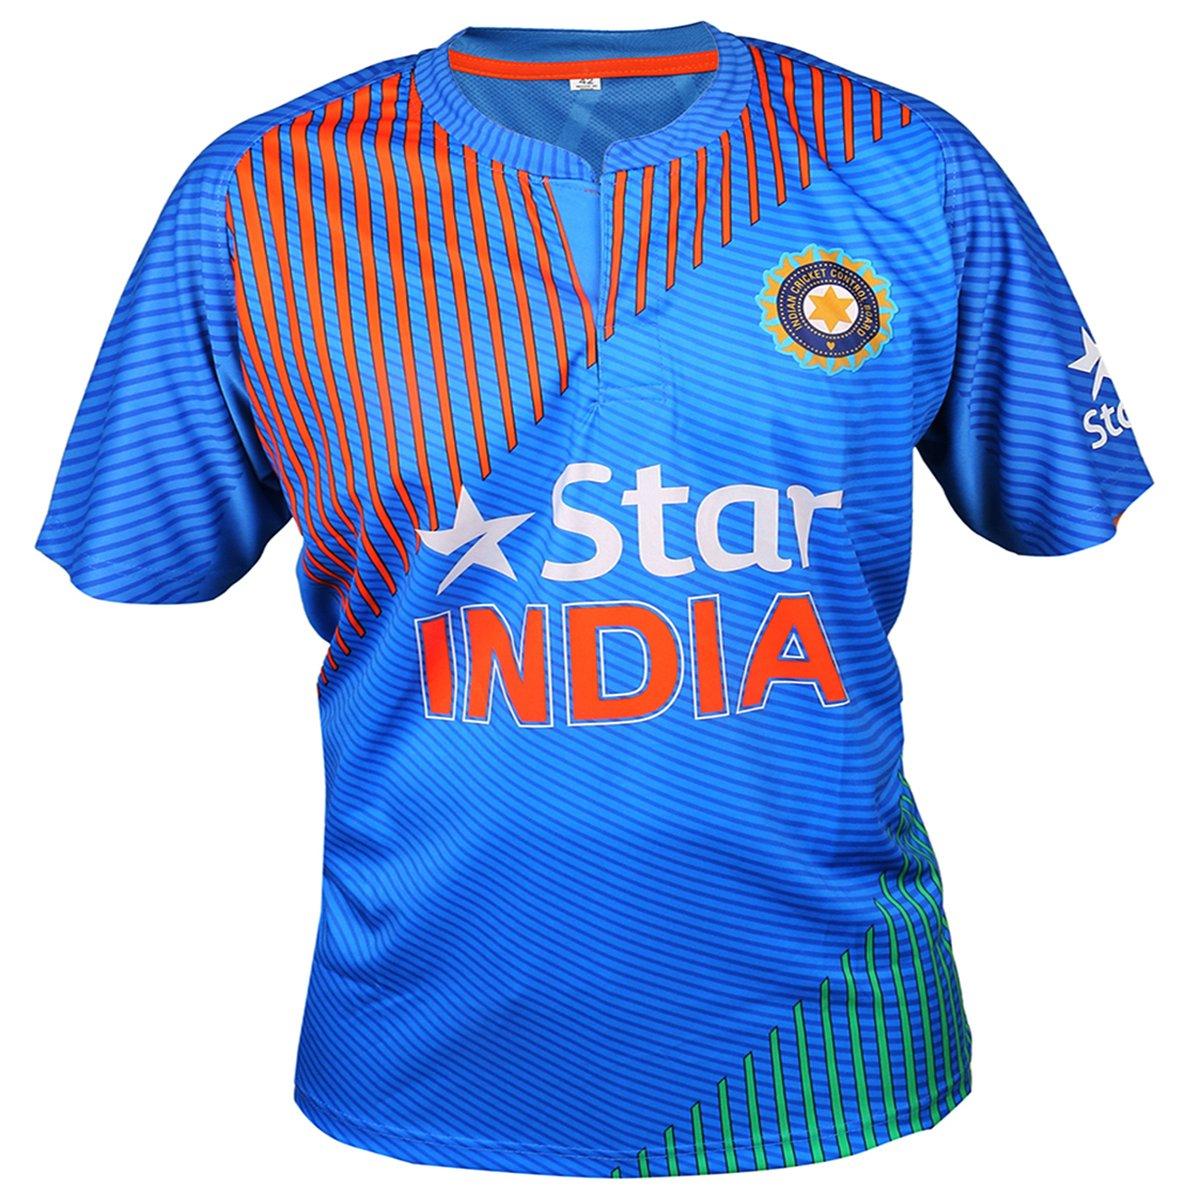 Yuva Cricket Team India ODI T20 World Cup Jersey Sachin Virat Dhoni 2016